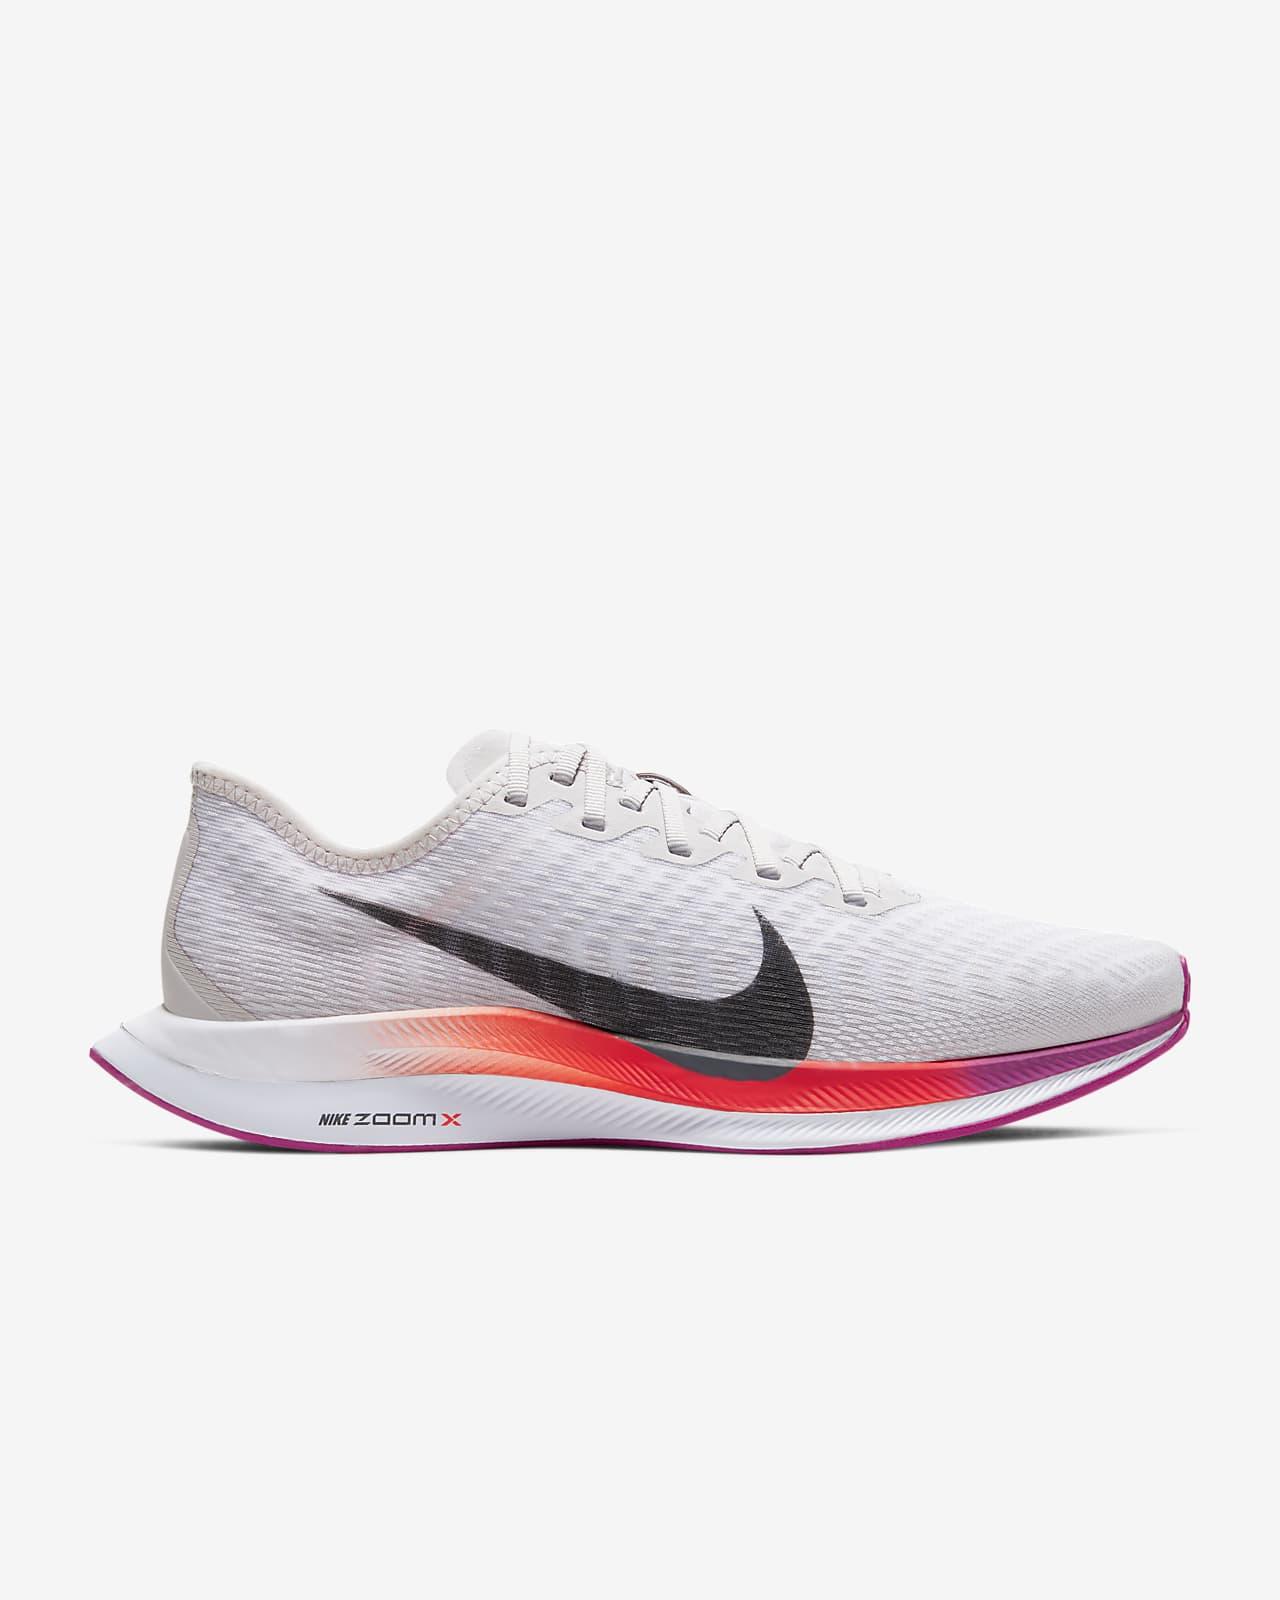 Chaussure de running Nike Zoom Pegasus Turbo 2 pour Femme